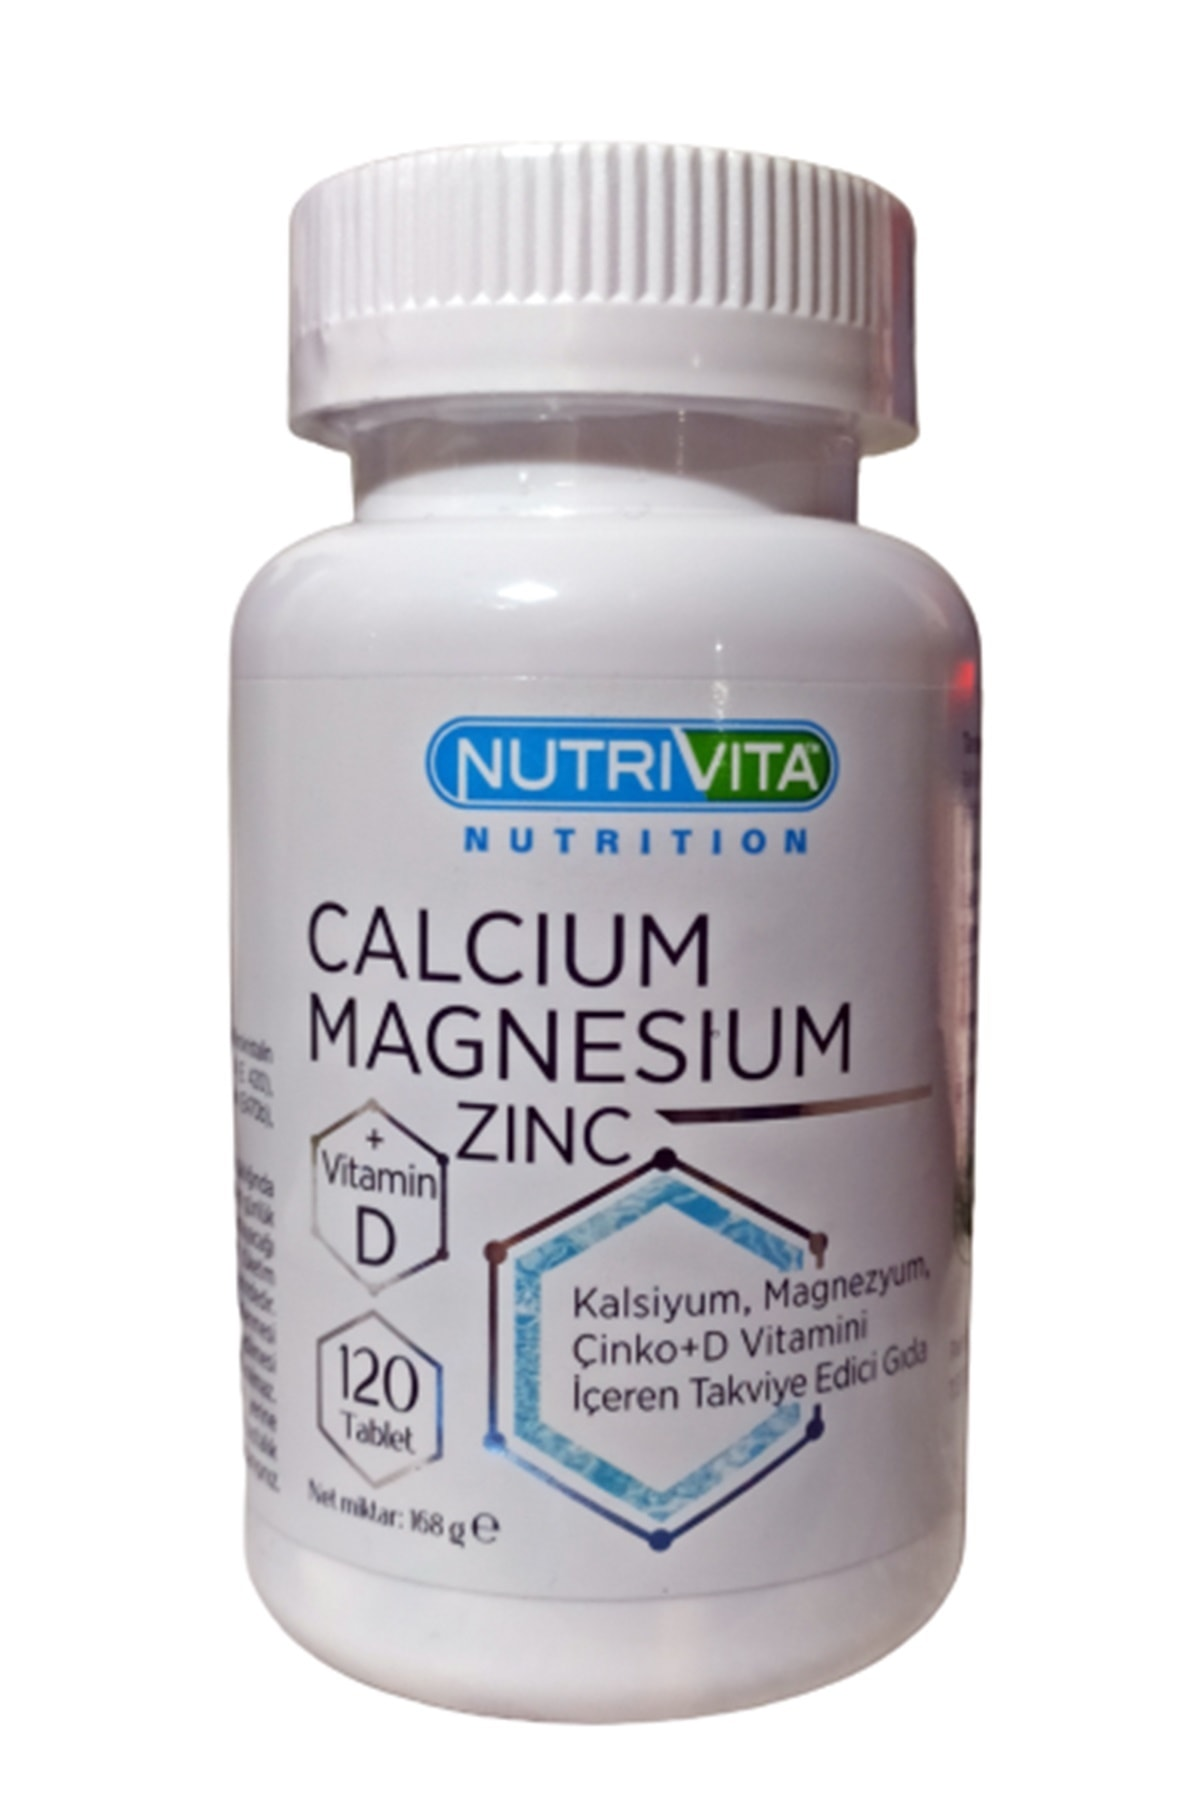 Nutrivita Nutrition Calcium (kalsiyum) Magnesium (magnezyum) Zinc Vitamin D 120 Tablet Stk 01/2024 1